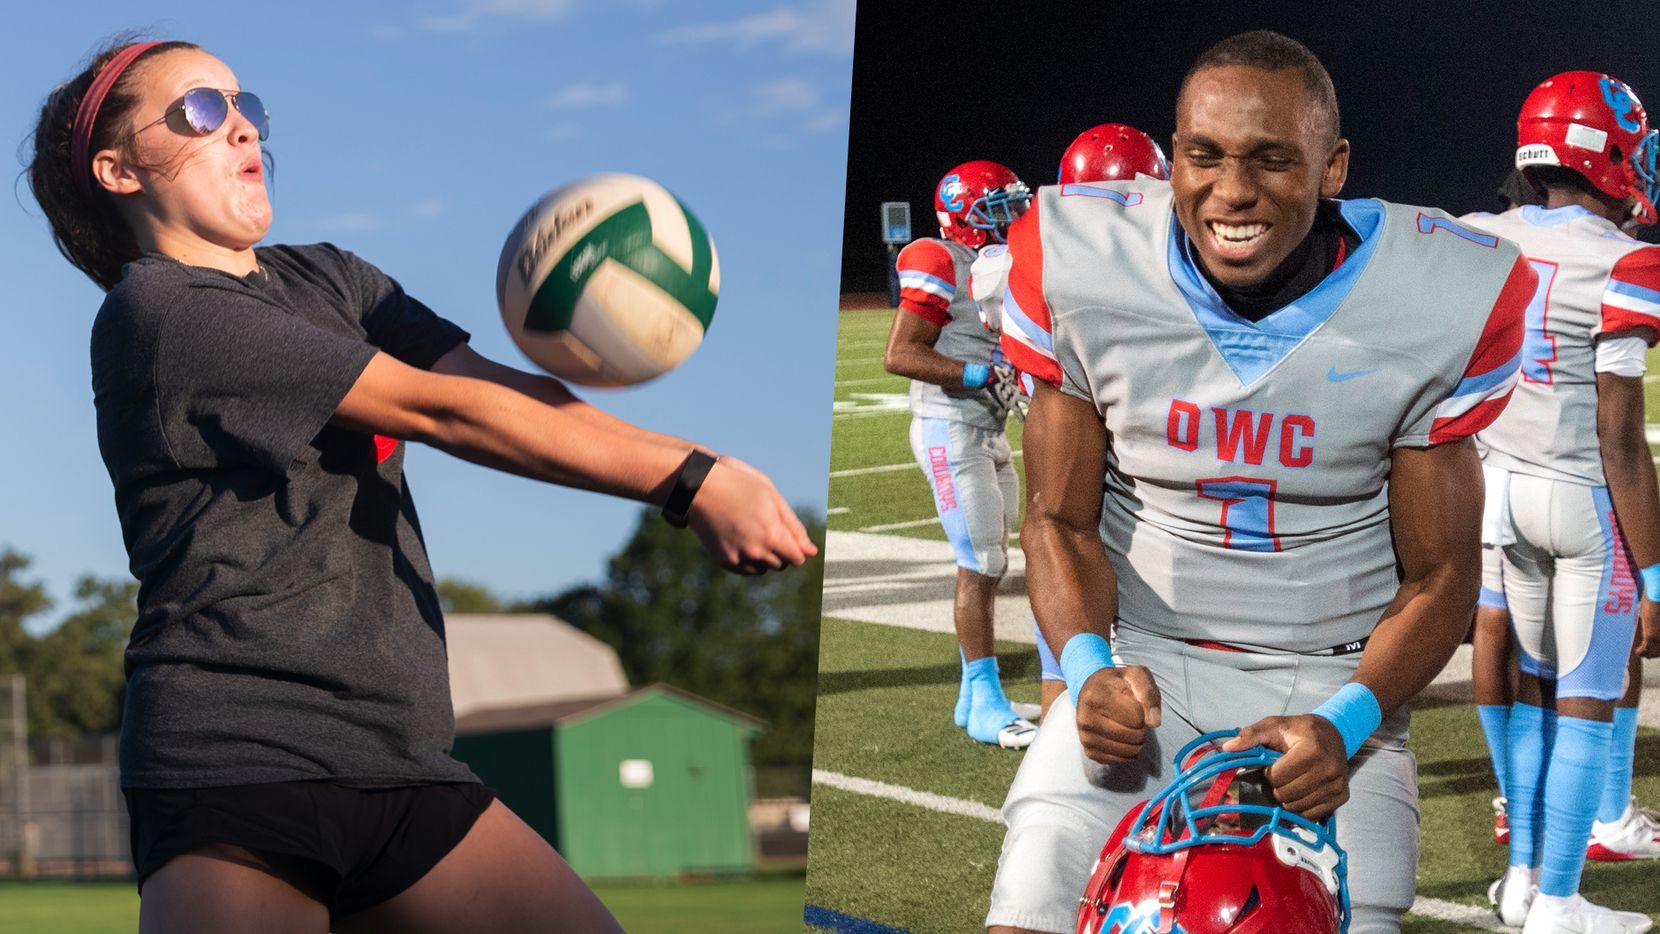 Arlington's Tatum Torres (left) and Carter's Kace Williams (right).